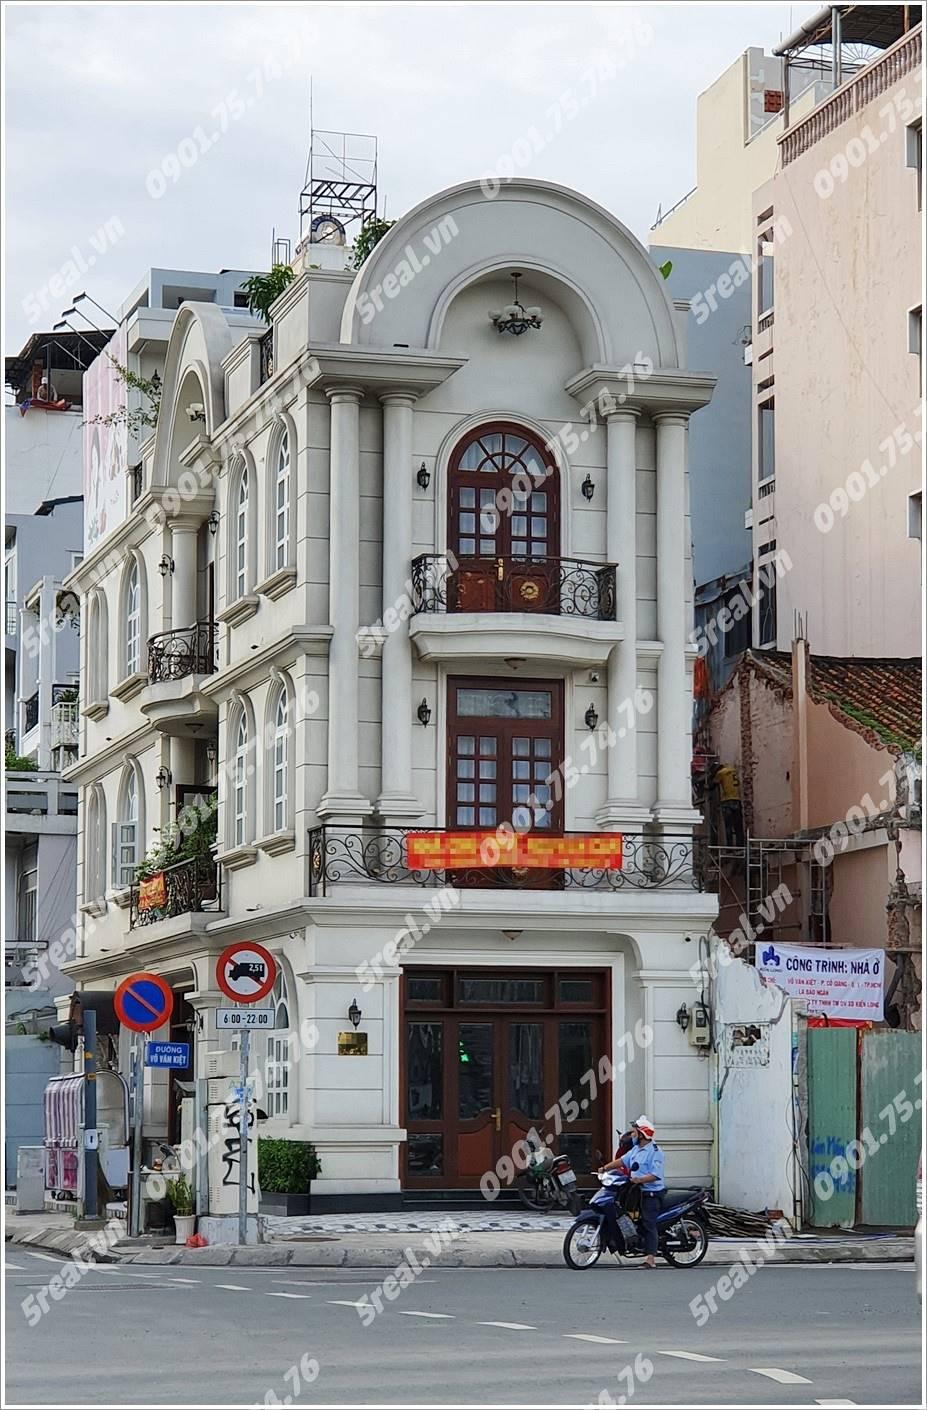 building-456-vo-van-kiet-quan-1-van-phong-cho-thue-5real.vn-01